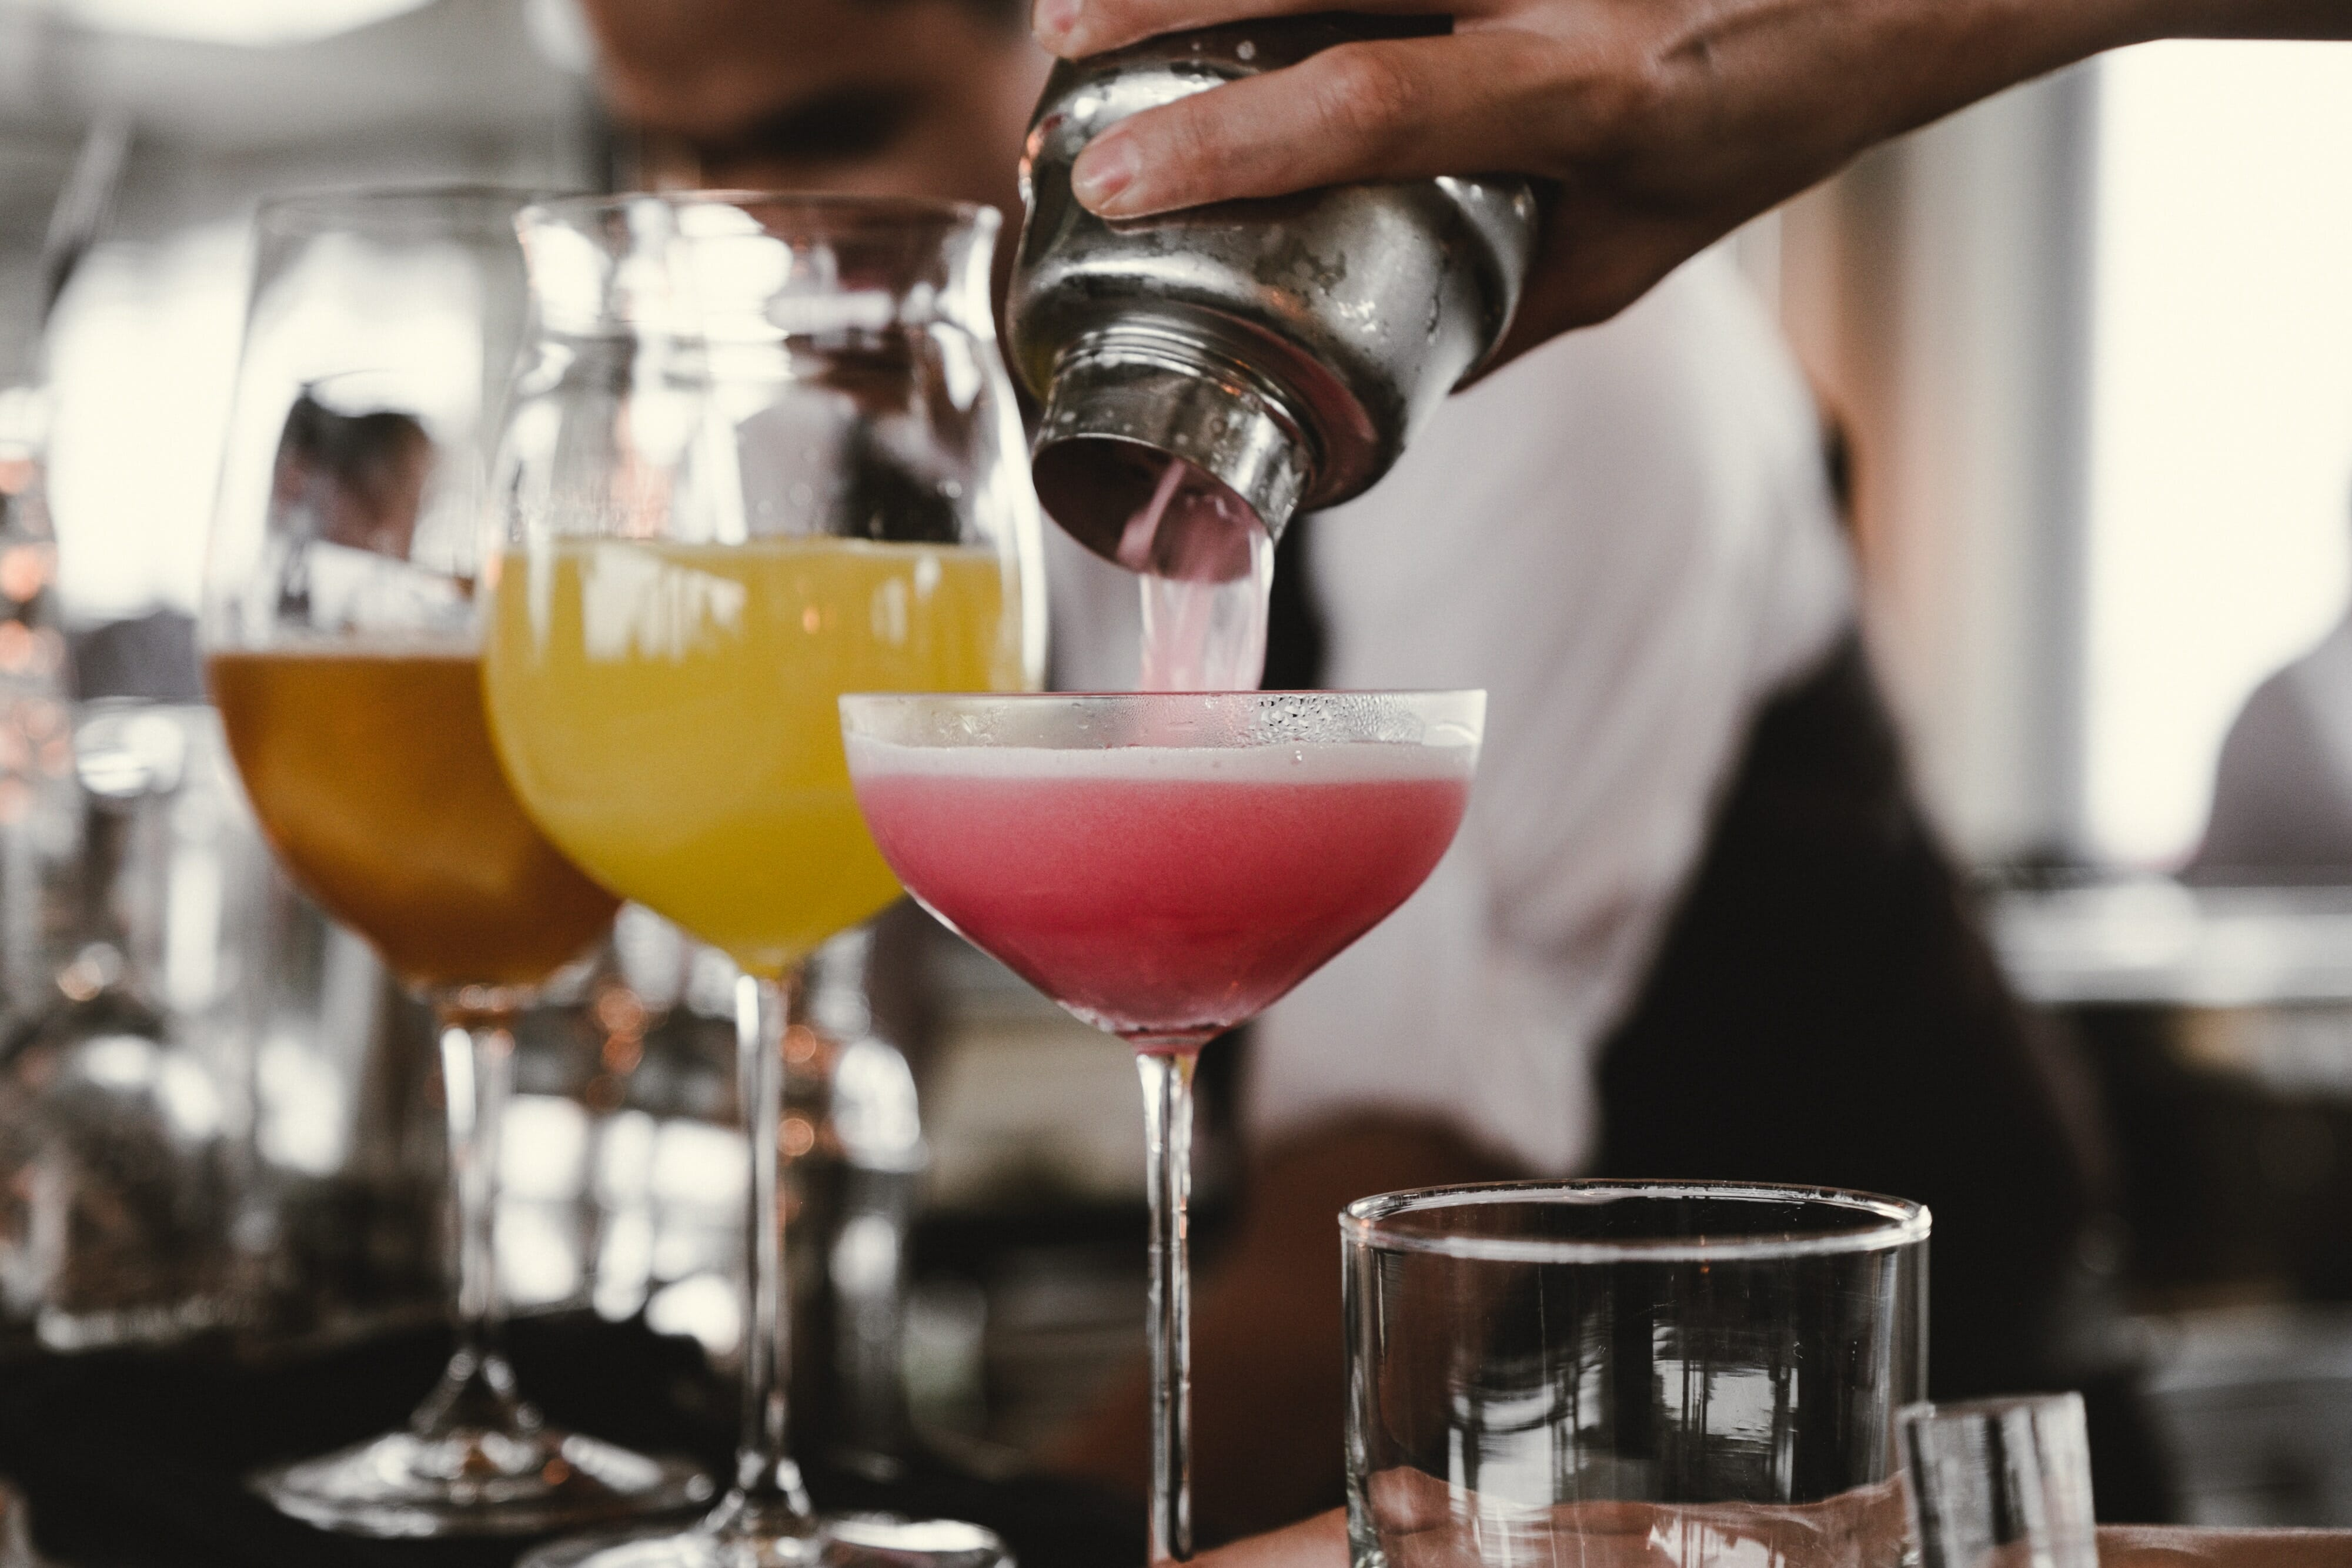 Curso de Barman en Barcelona - FormRooms